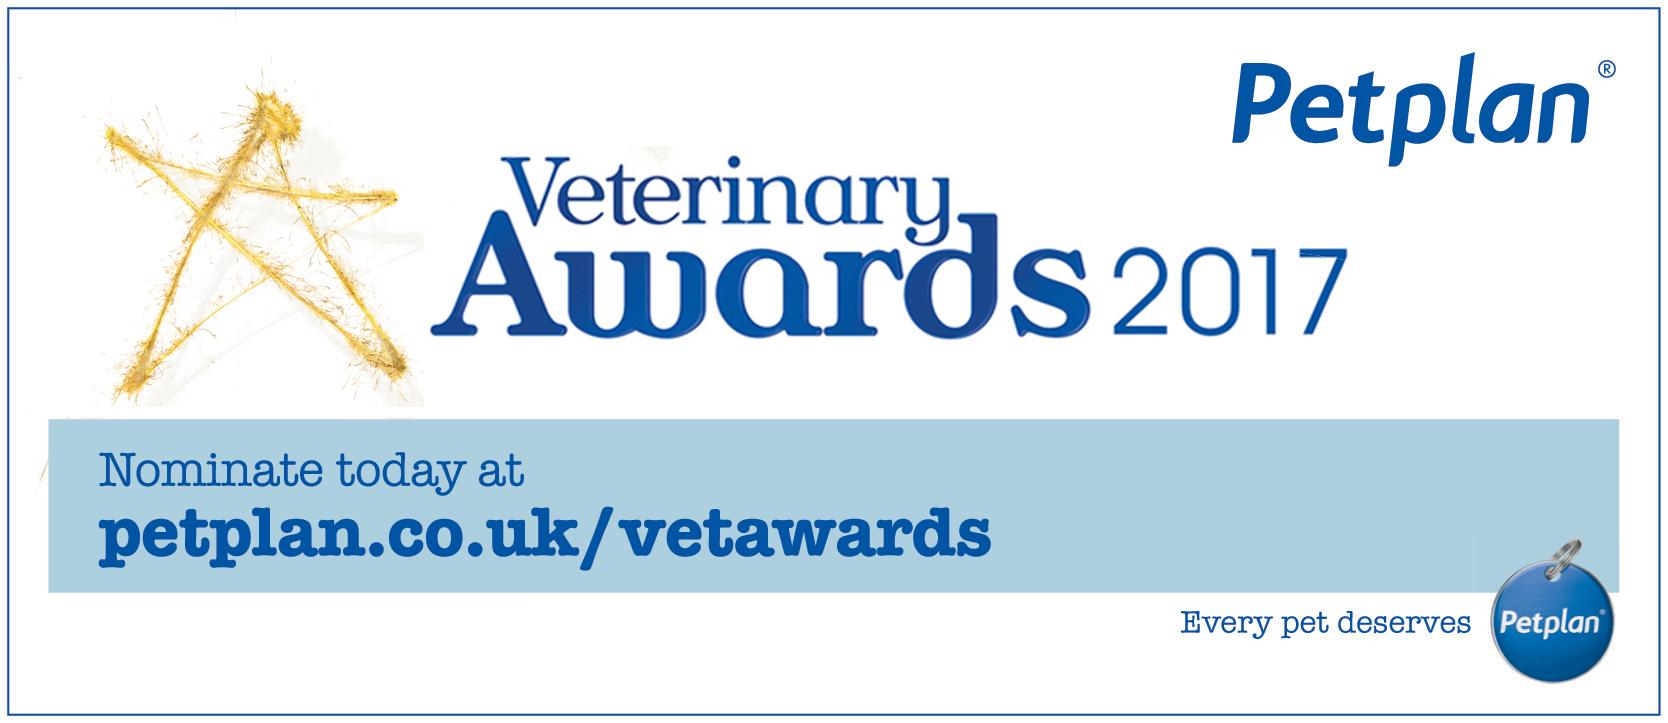 Petplan vet awards